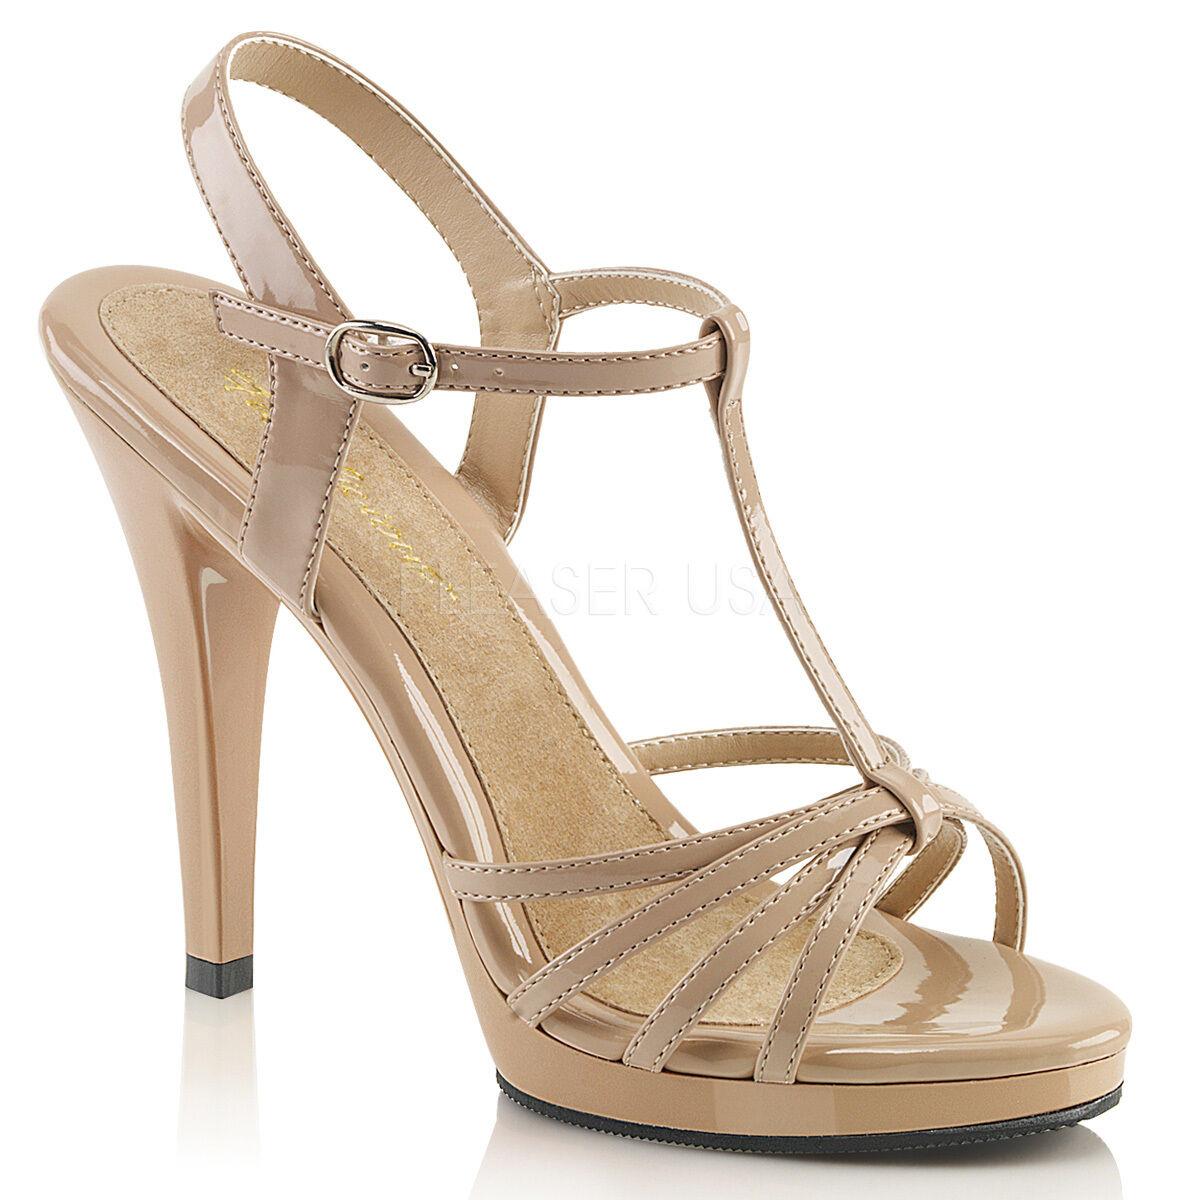 Damenschuhe Schuhes Größe 4 Nude Pleaser Flair-420 T-Strap Strappy Sandales High Heel New